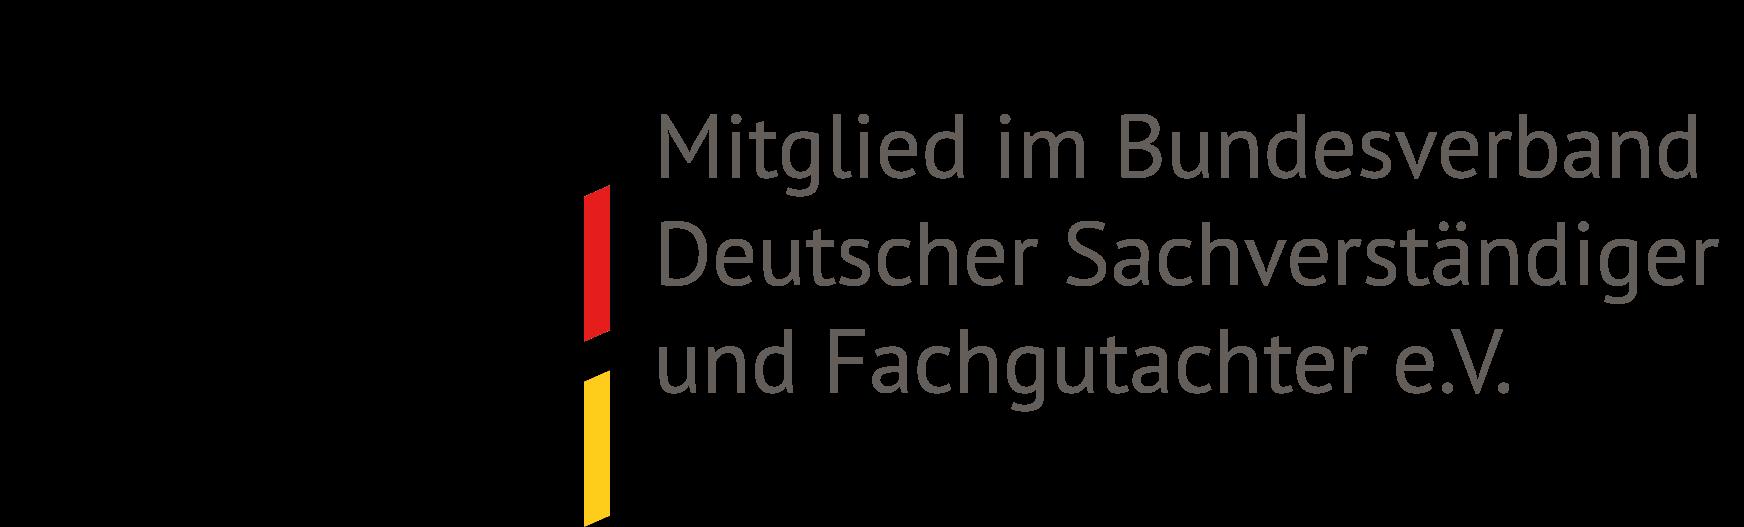 EDV Sachverständiger Gutachter Hildesheim Hannover